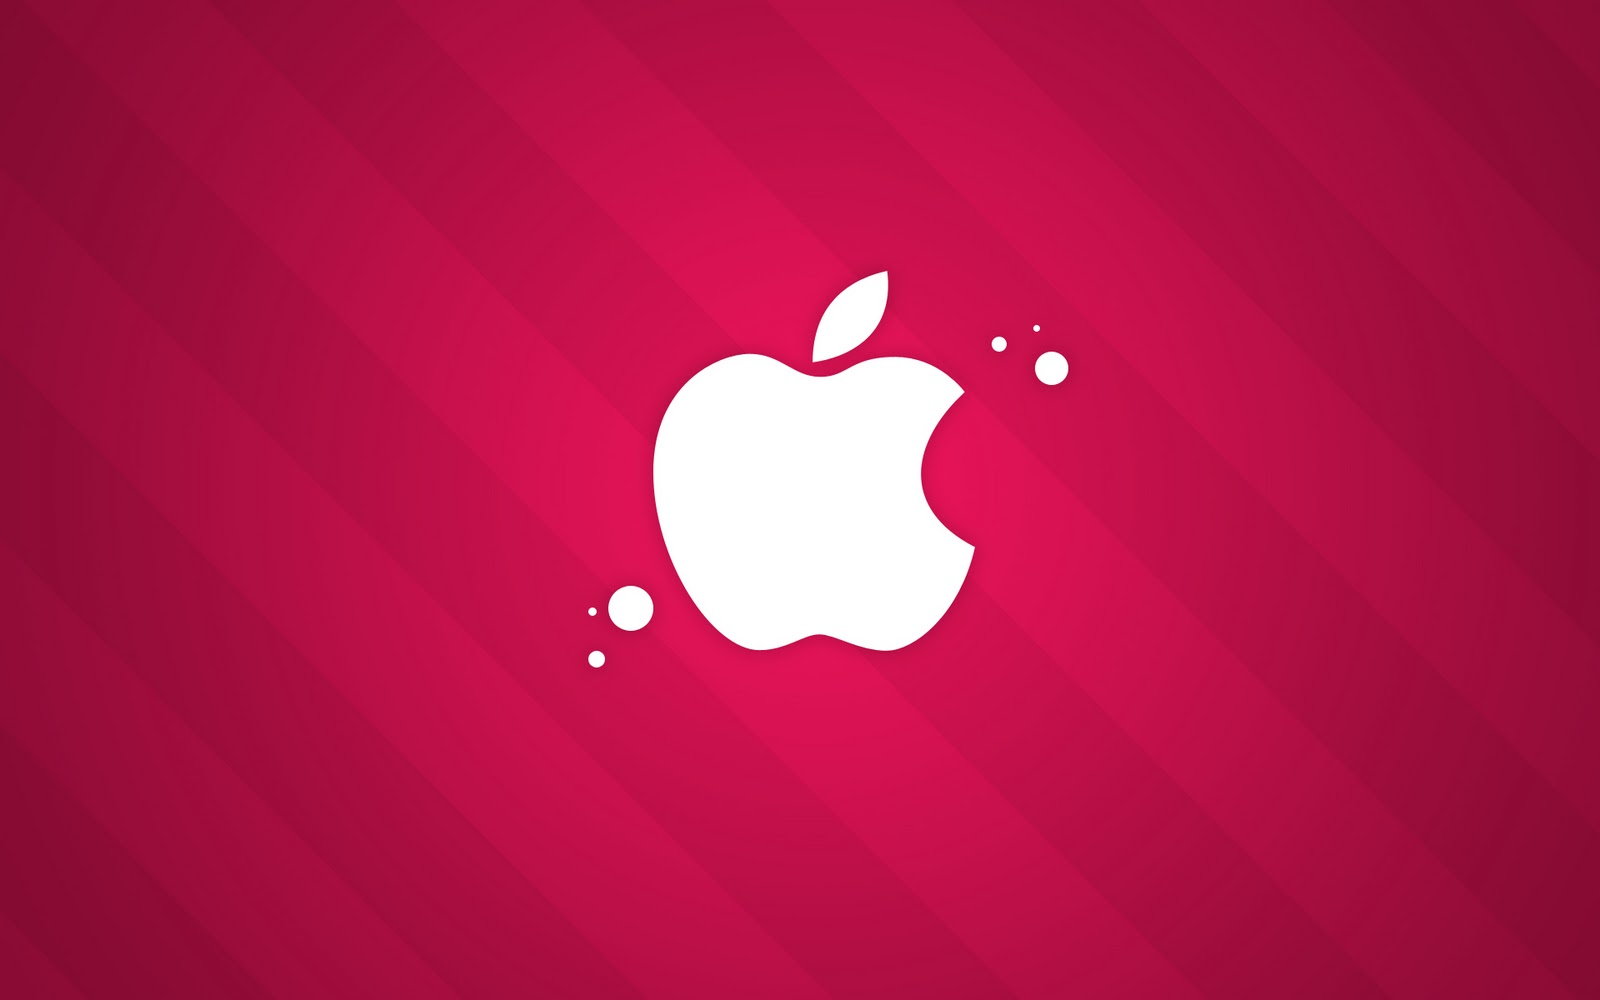 http://3.bp.blogspot.com/_Uf42tA7xWWA/S89CRCsgh1I/AAAAAAAABT8/enux_fH-3jc/s1600/Free%20Apple%20Desktop%20Pictures%20Pink%20Leopard.jpg